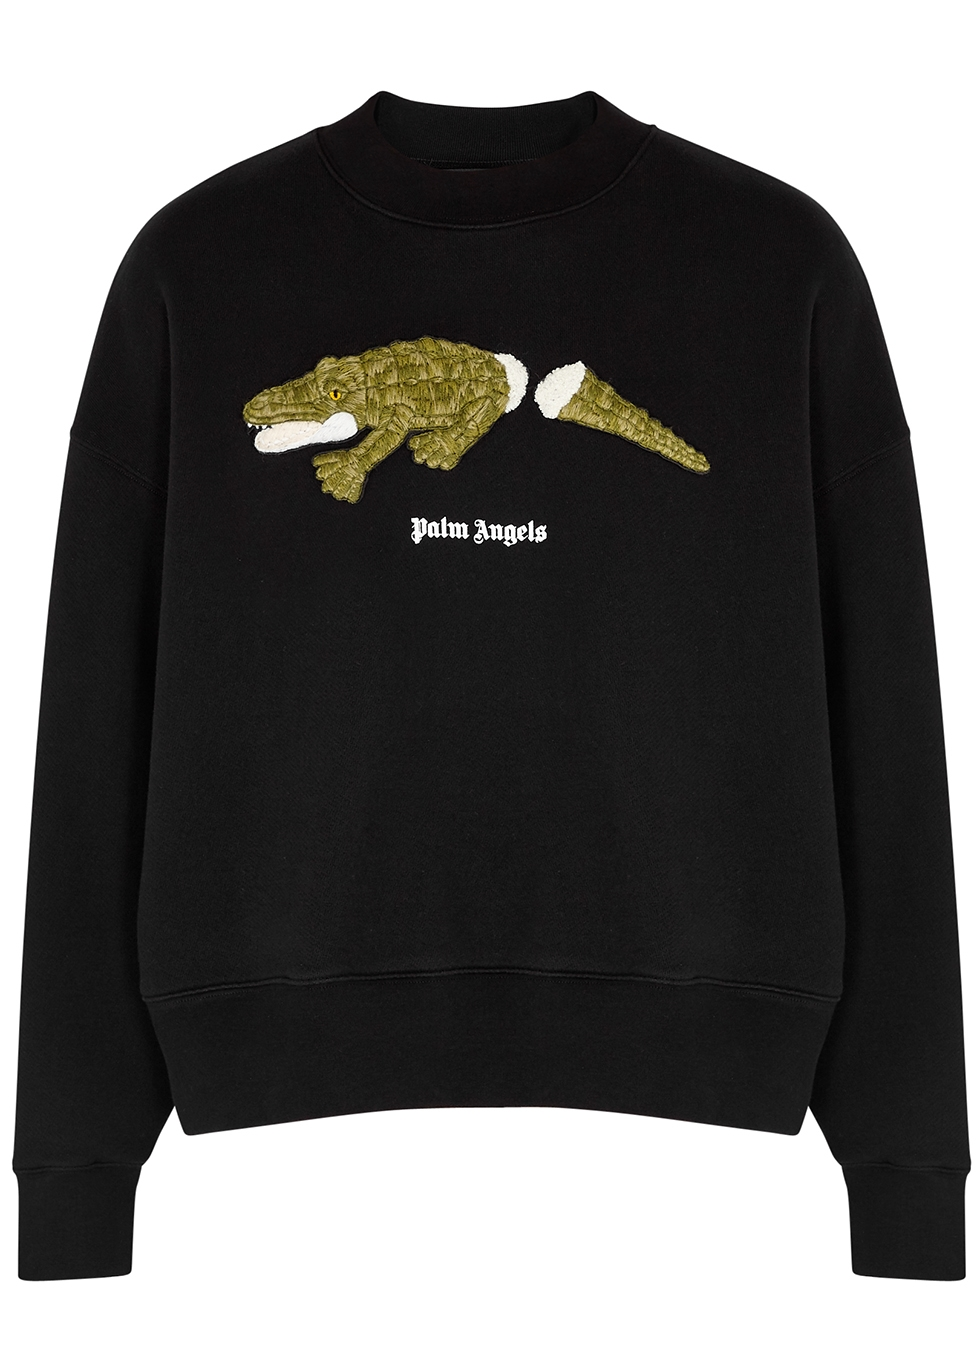 Croco embroidered cotton sweatshirt